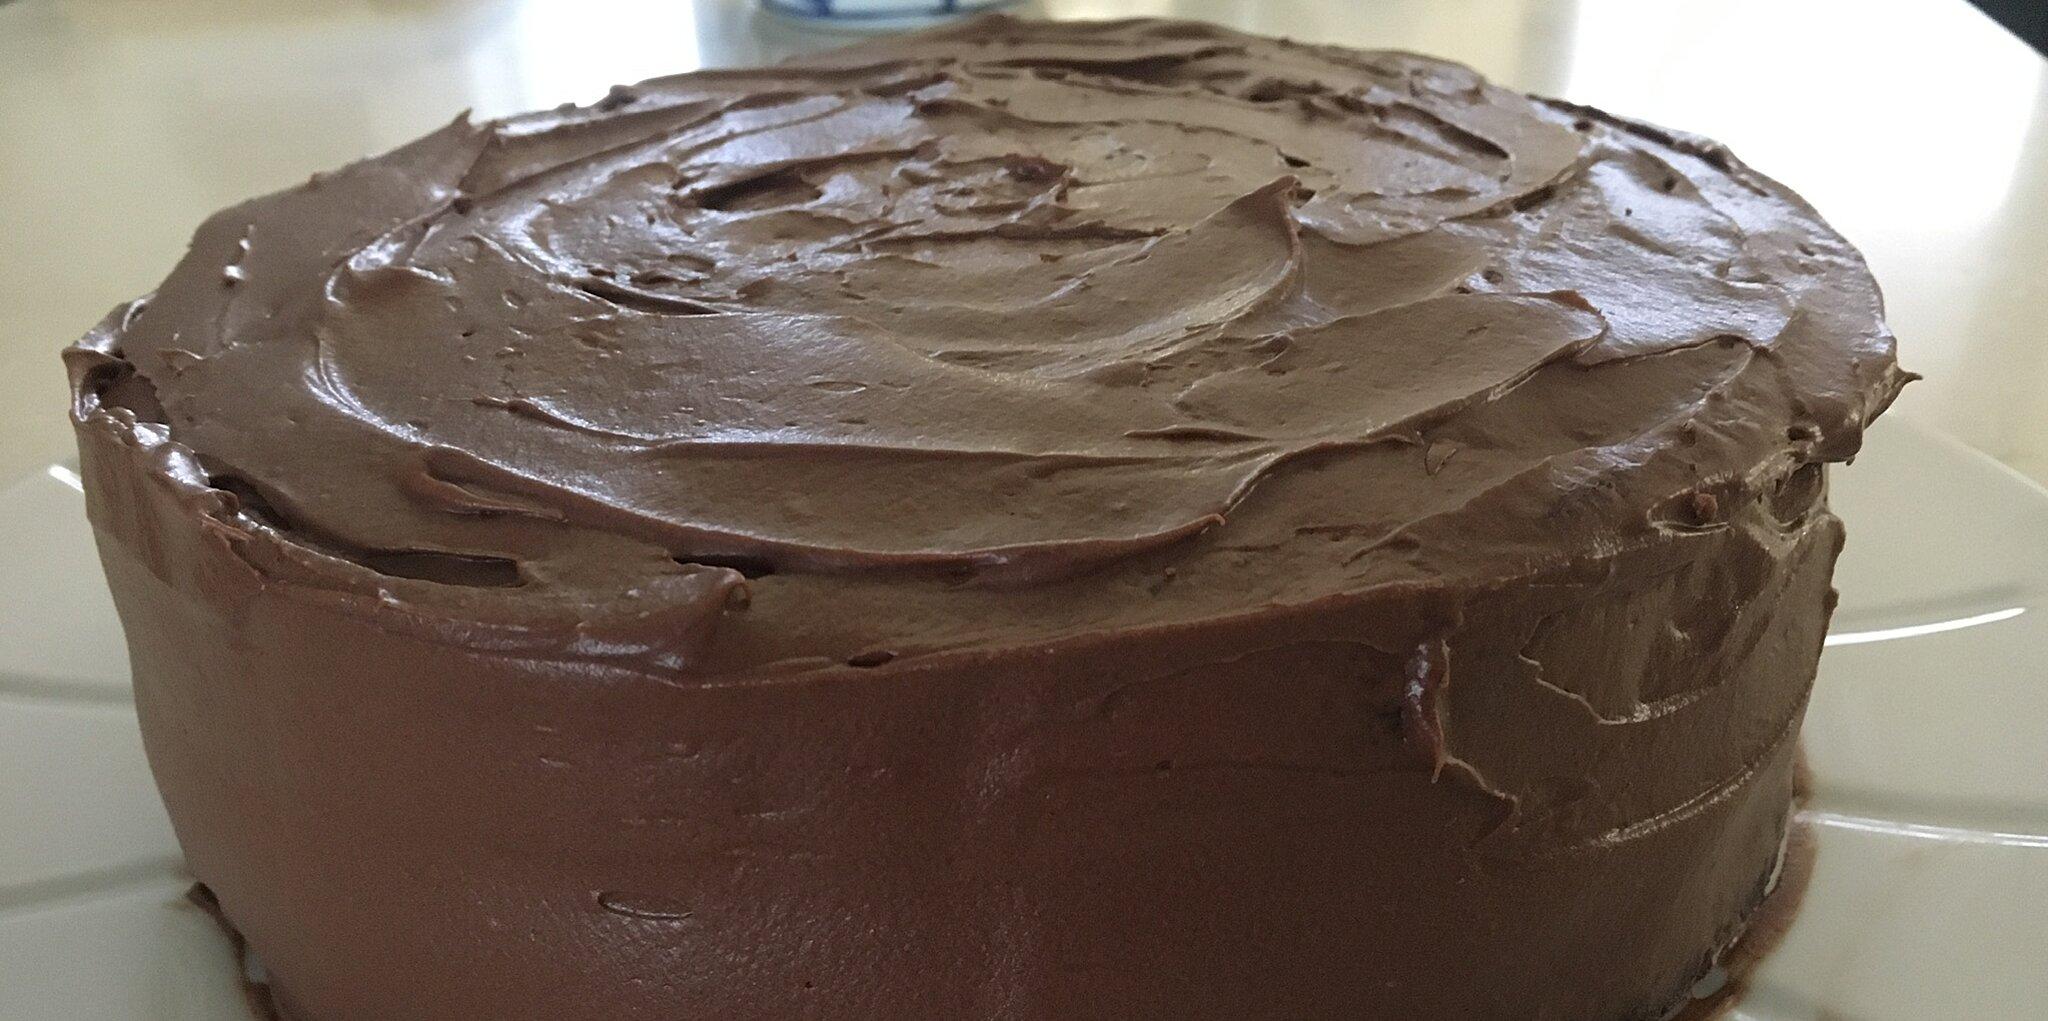 greek yogurt chocolate cake recipe